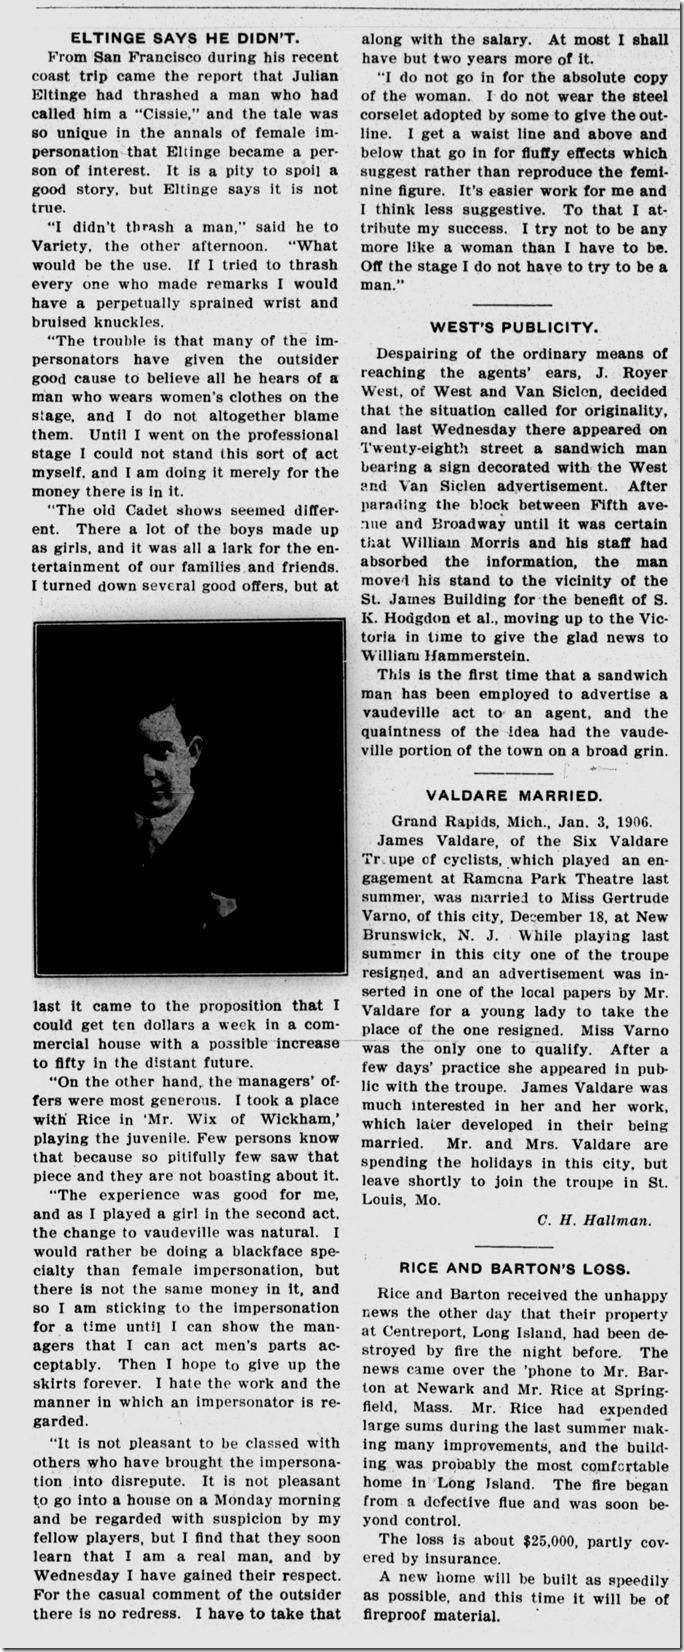 Variety, 1909